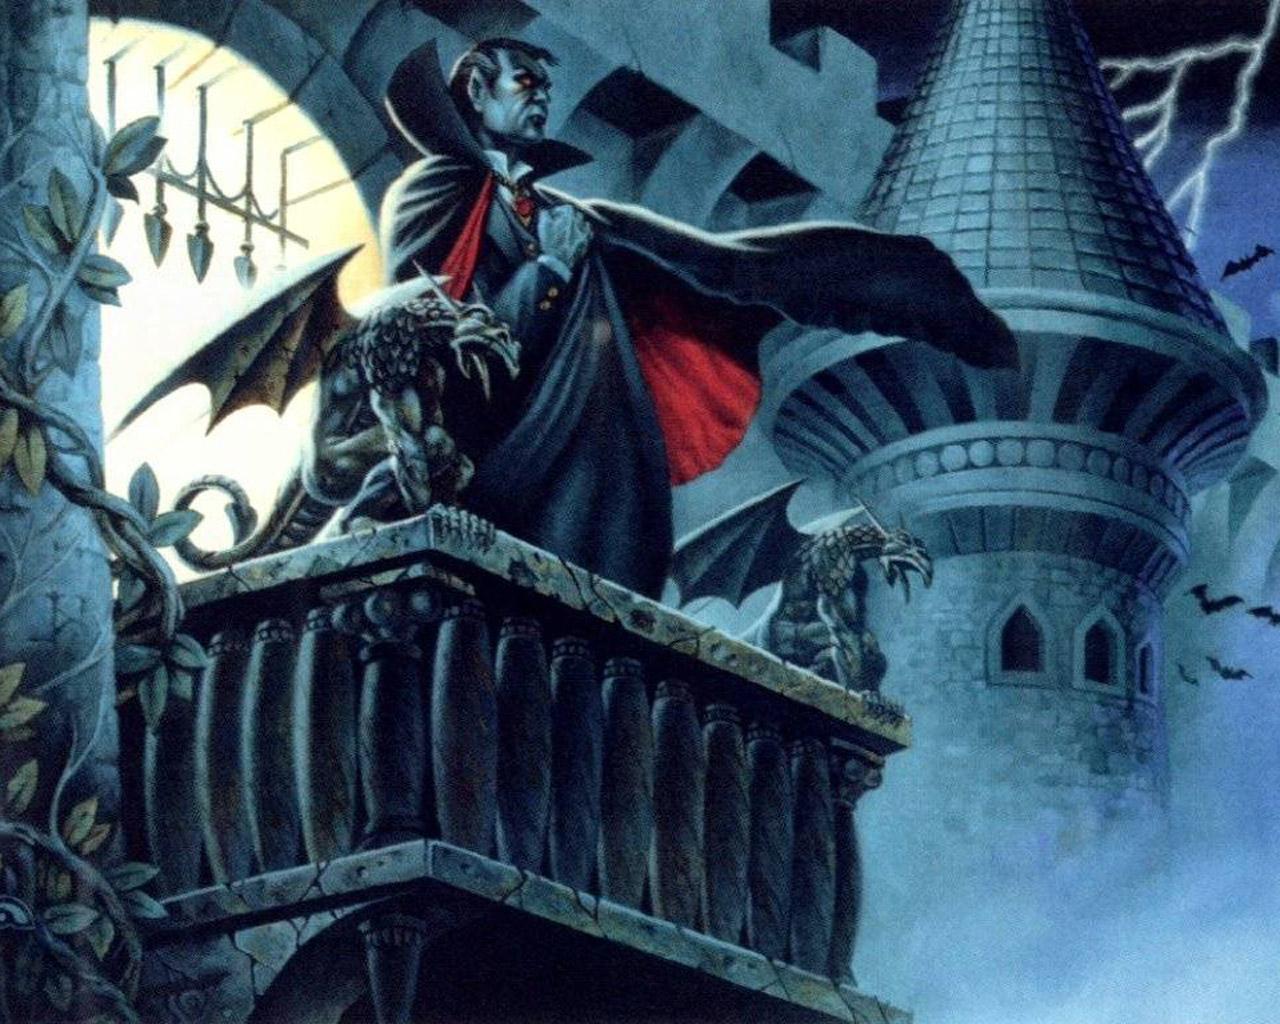 Games - Like a Boss - Count Strahd von Zarovich